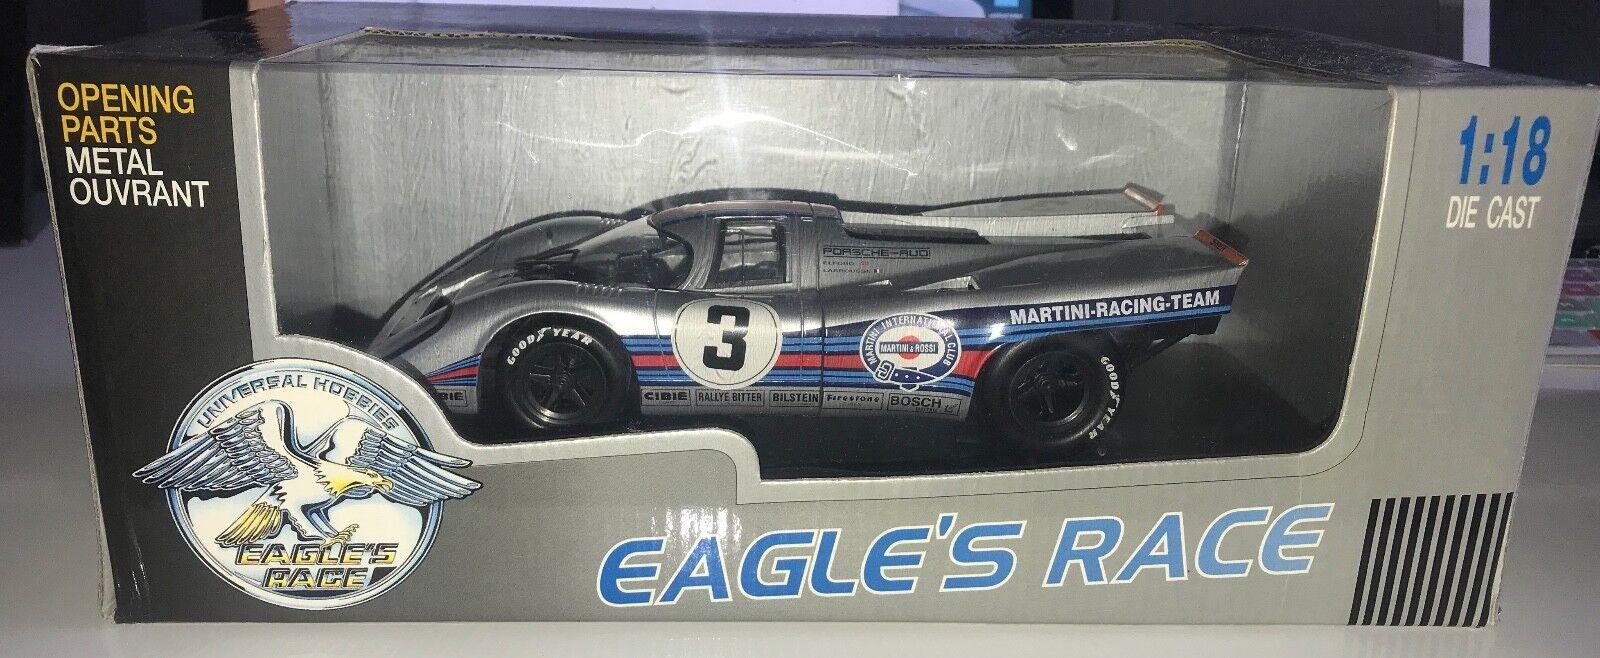 J3905 Eagles Race 1971 Martini Racing Porsche 917K Sebring 12 Hour 1 18 Scale